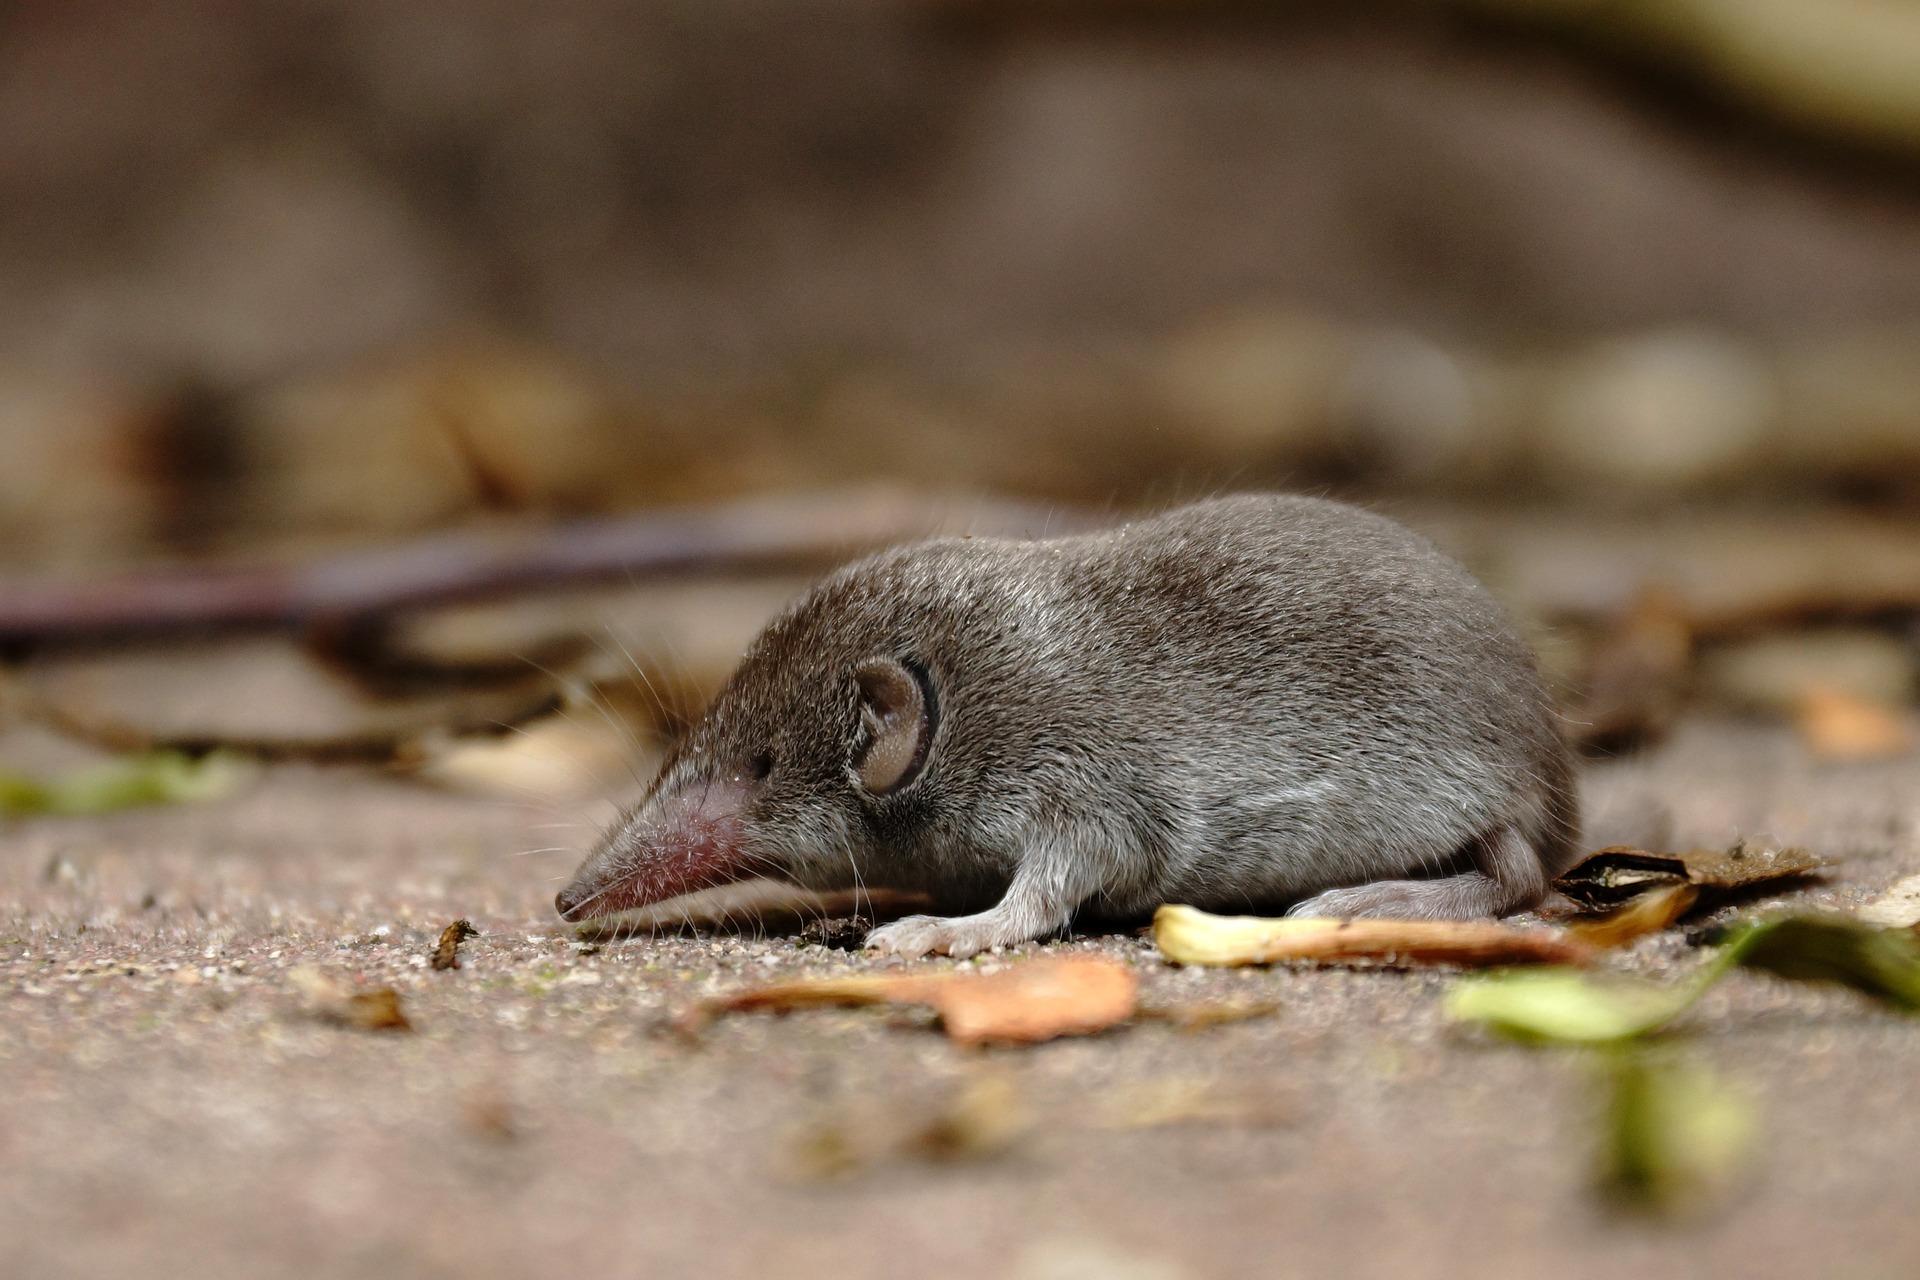 Spitzmaus - shrew